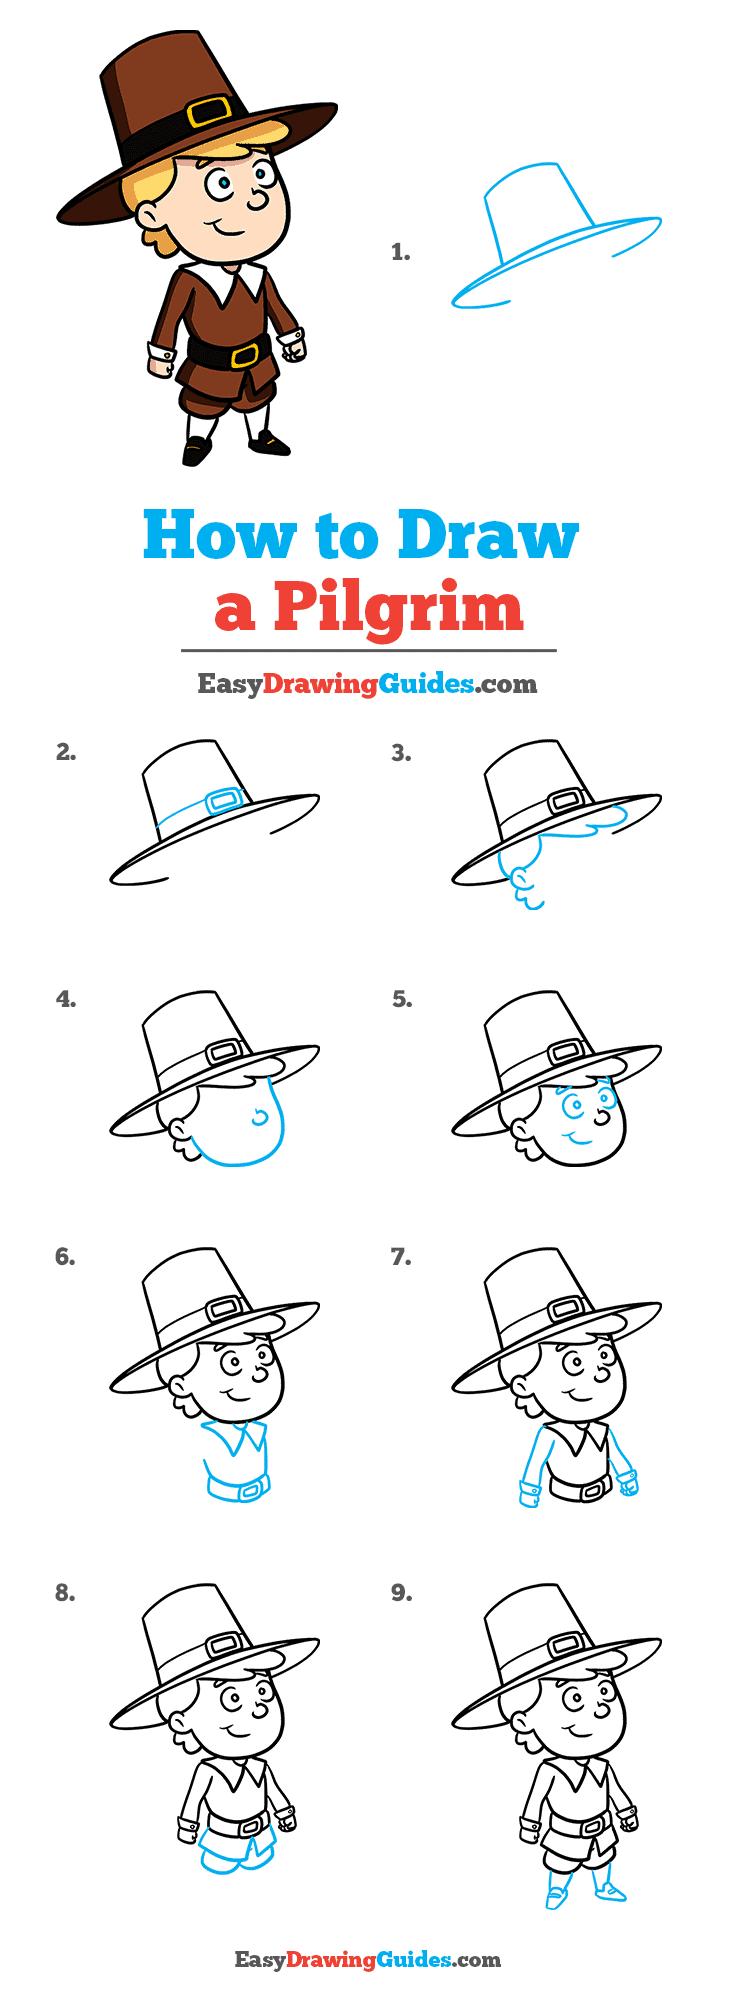 How to Draw a Pilgrim Step by Step Tutorial